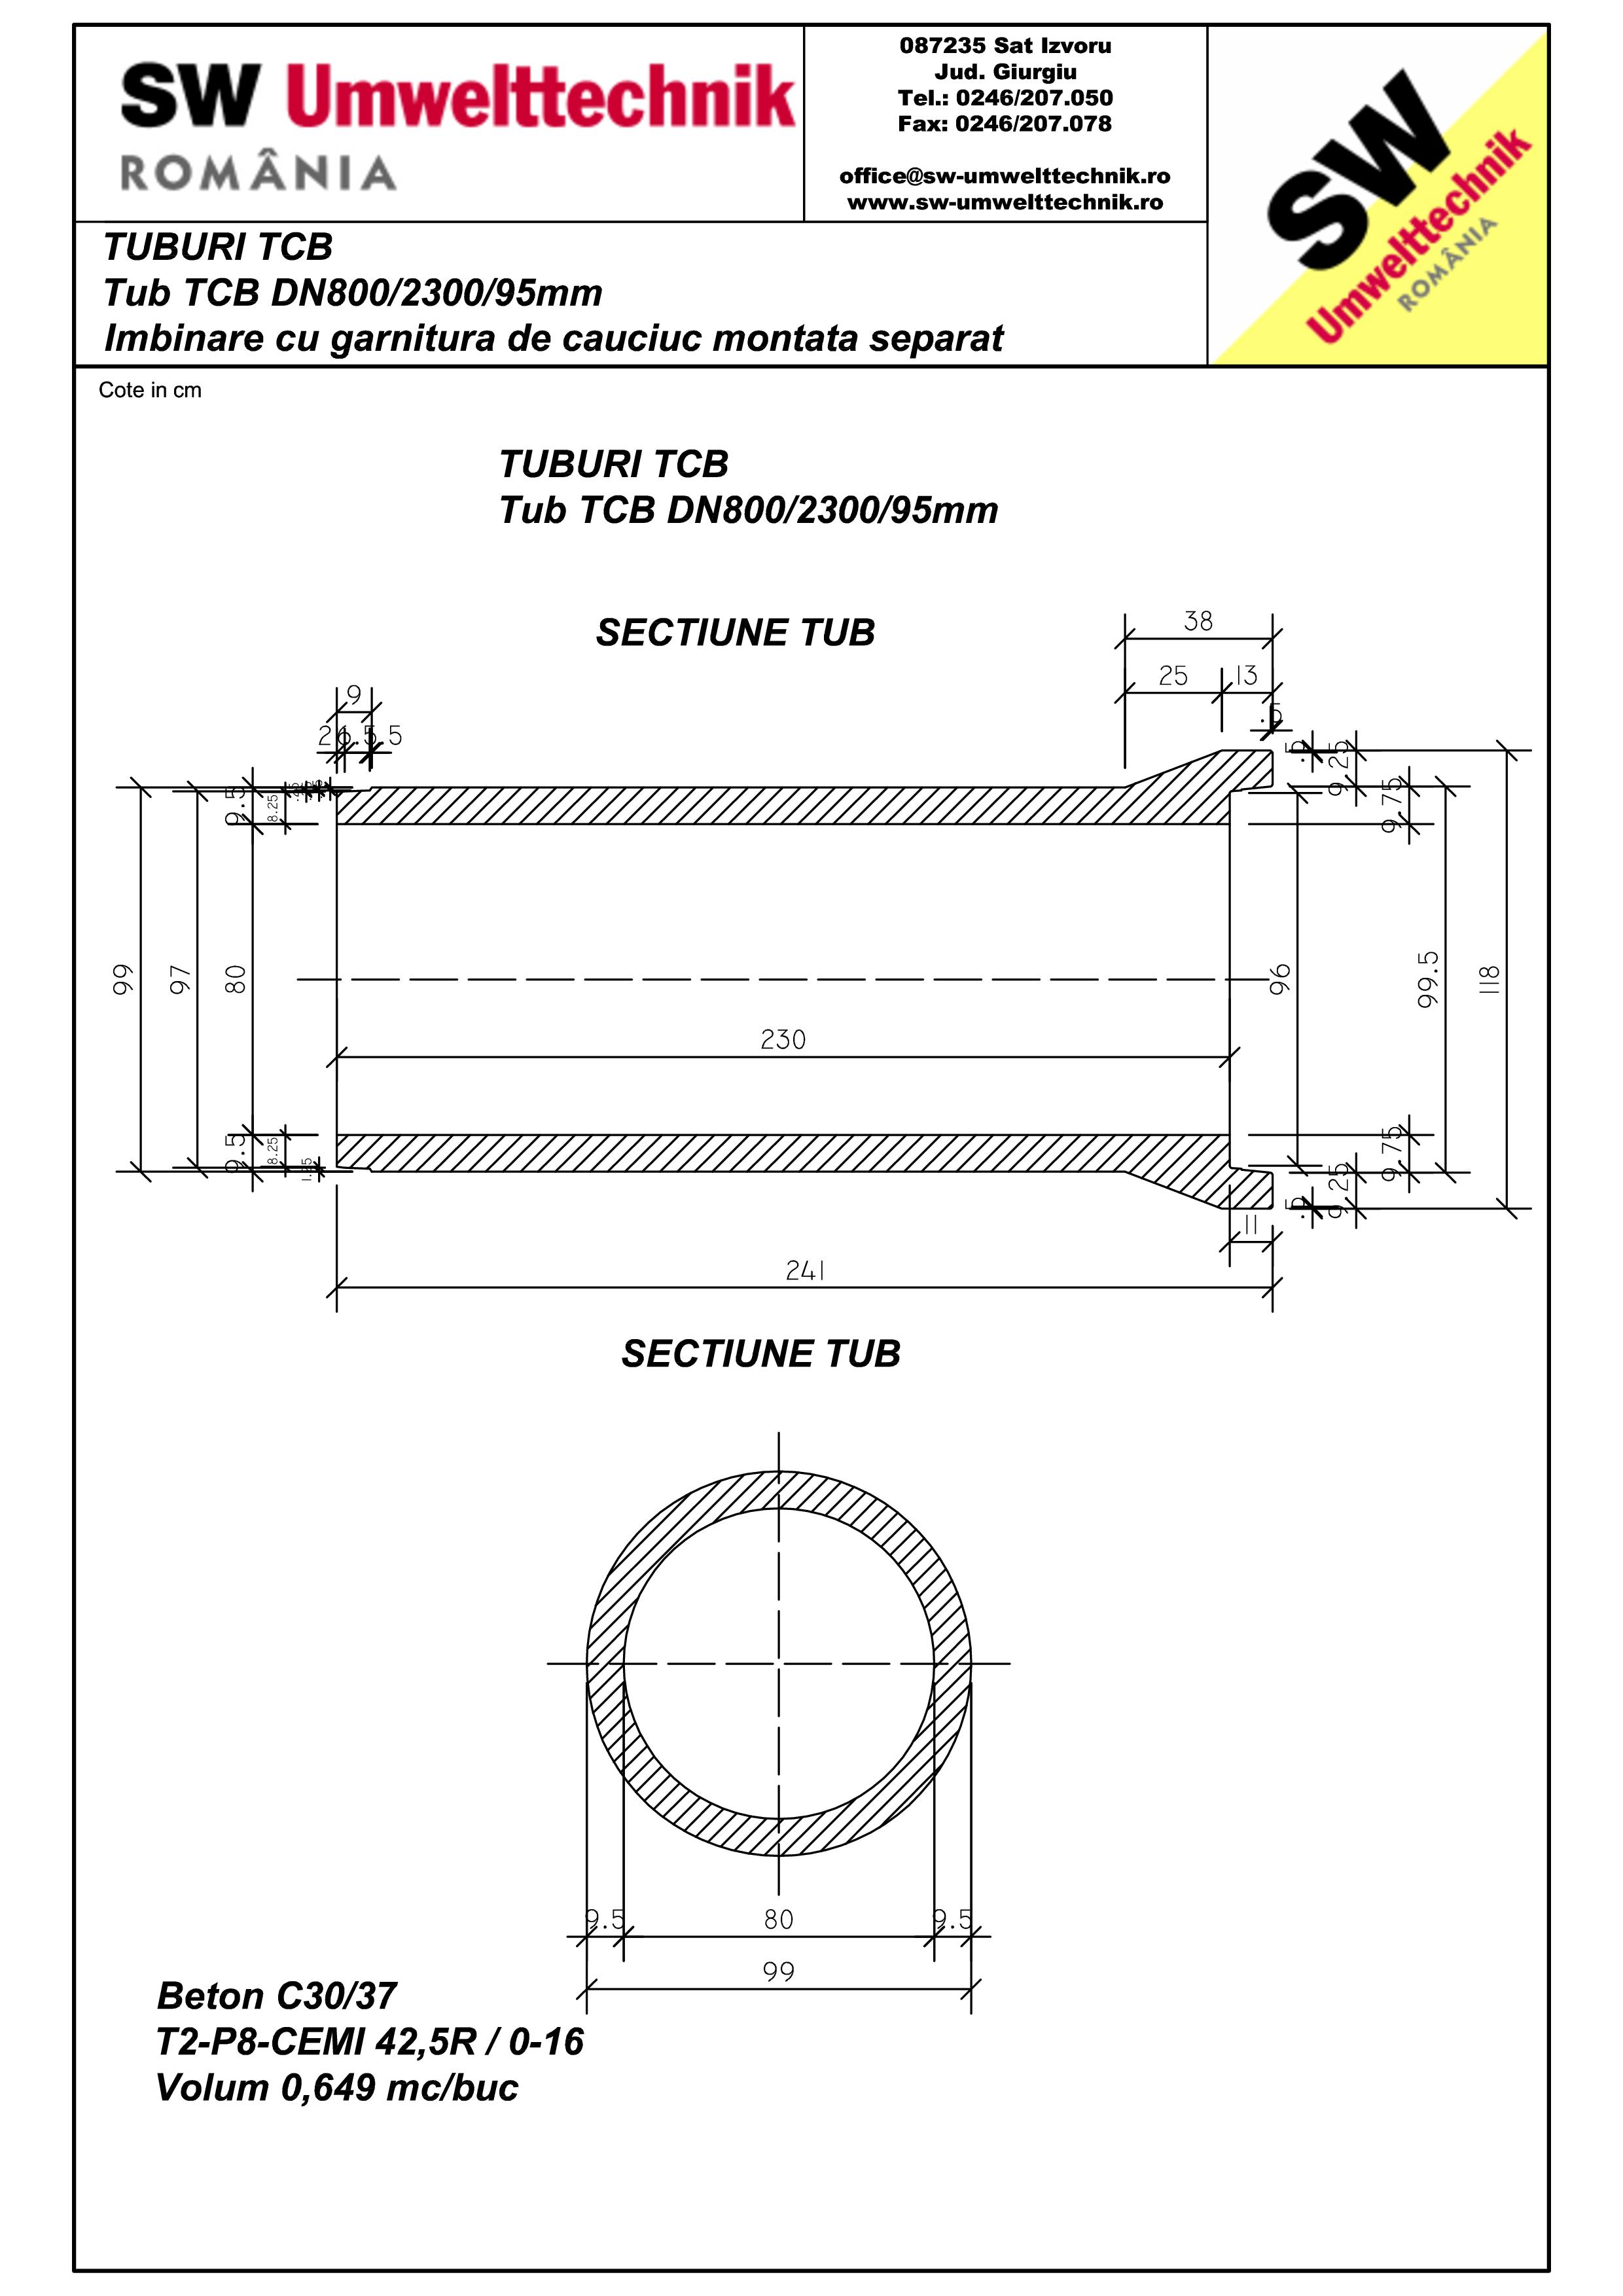 Pagina 1 - CAD-PDF Tub TCB DN800 L2,3m SW UMWELTTECHNIK Detaliu de produs